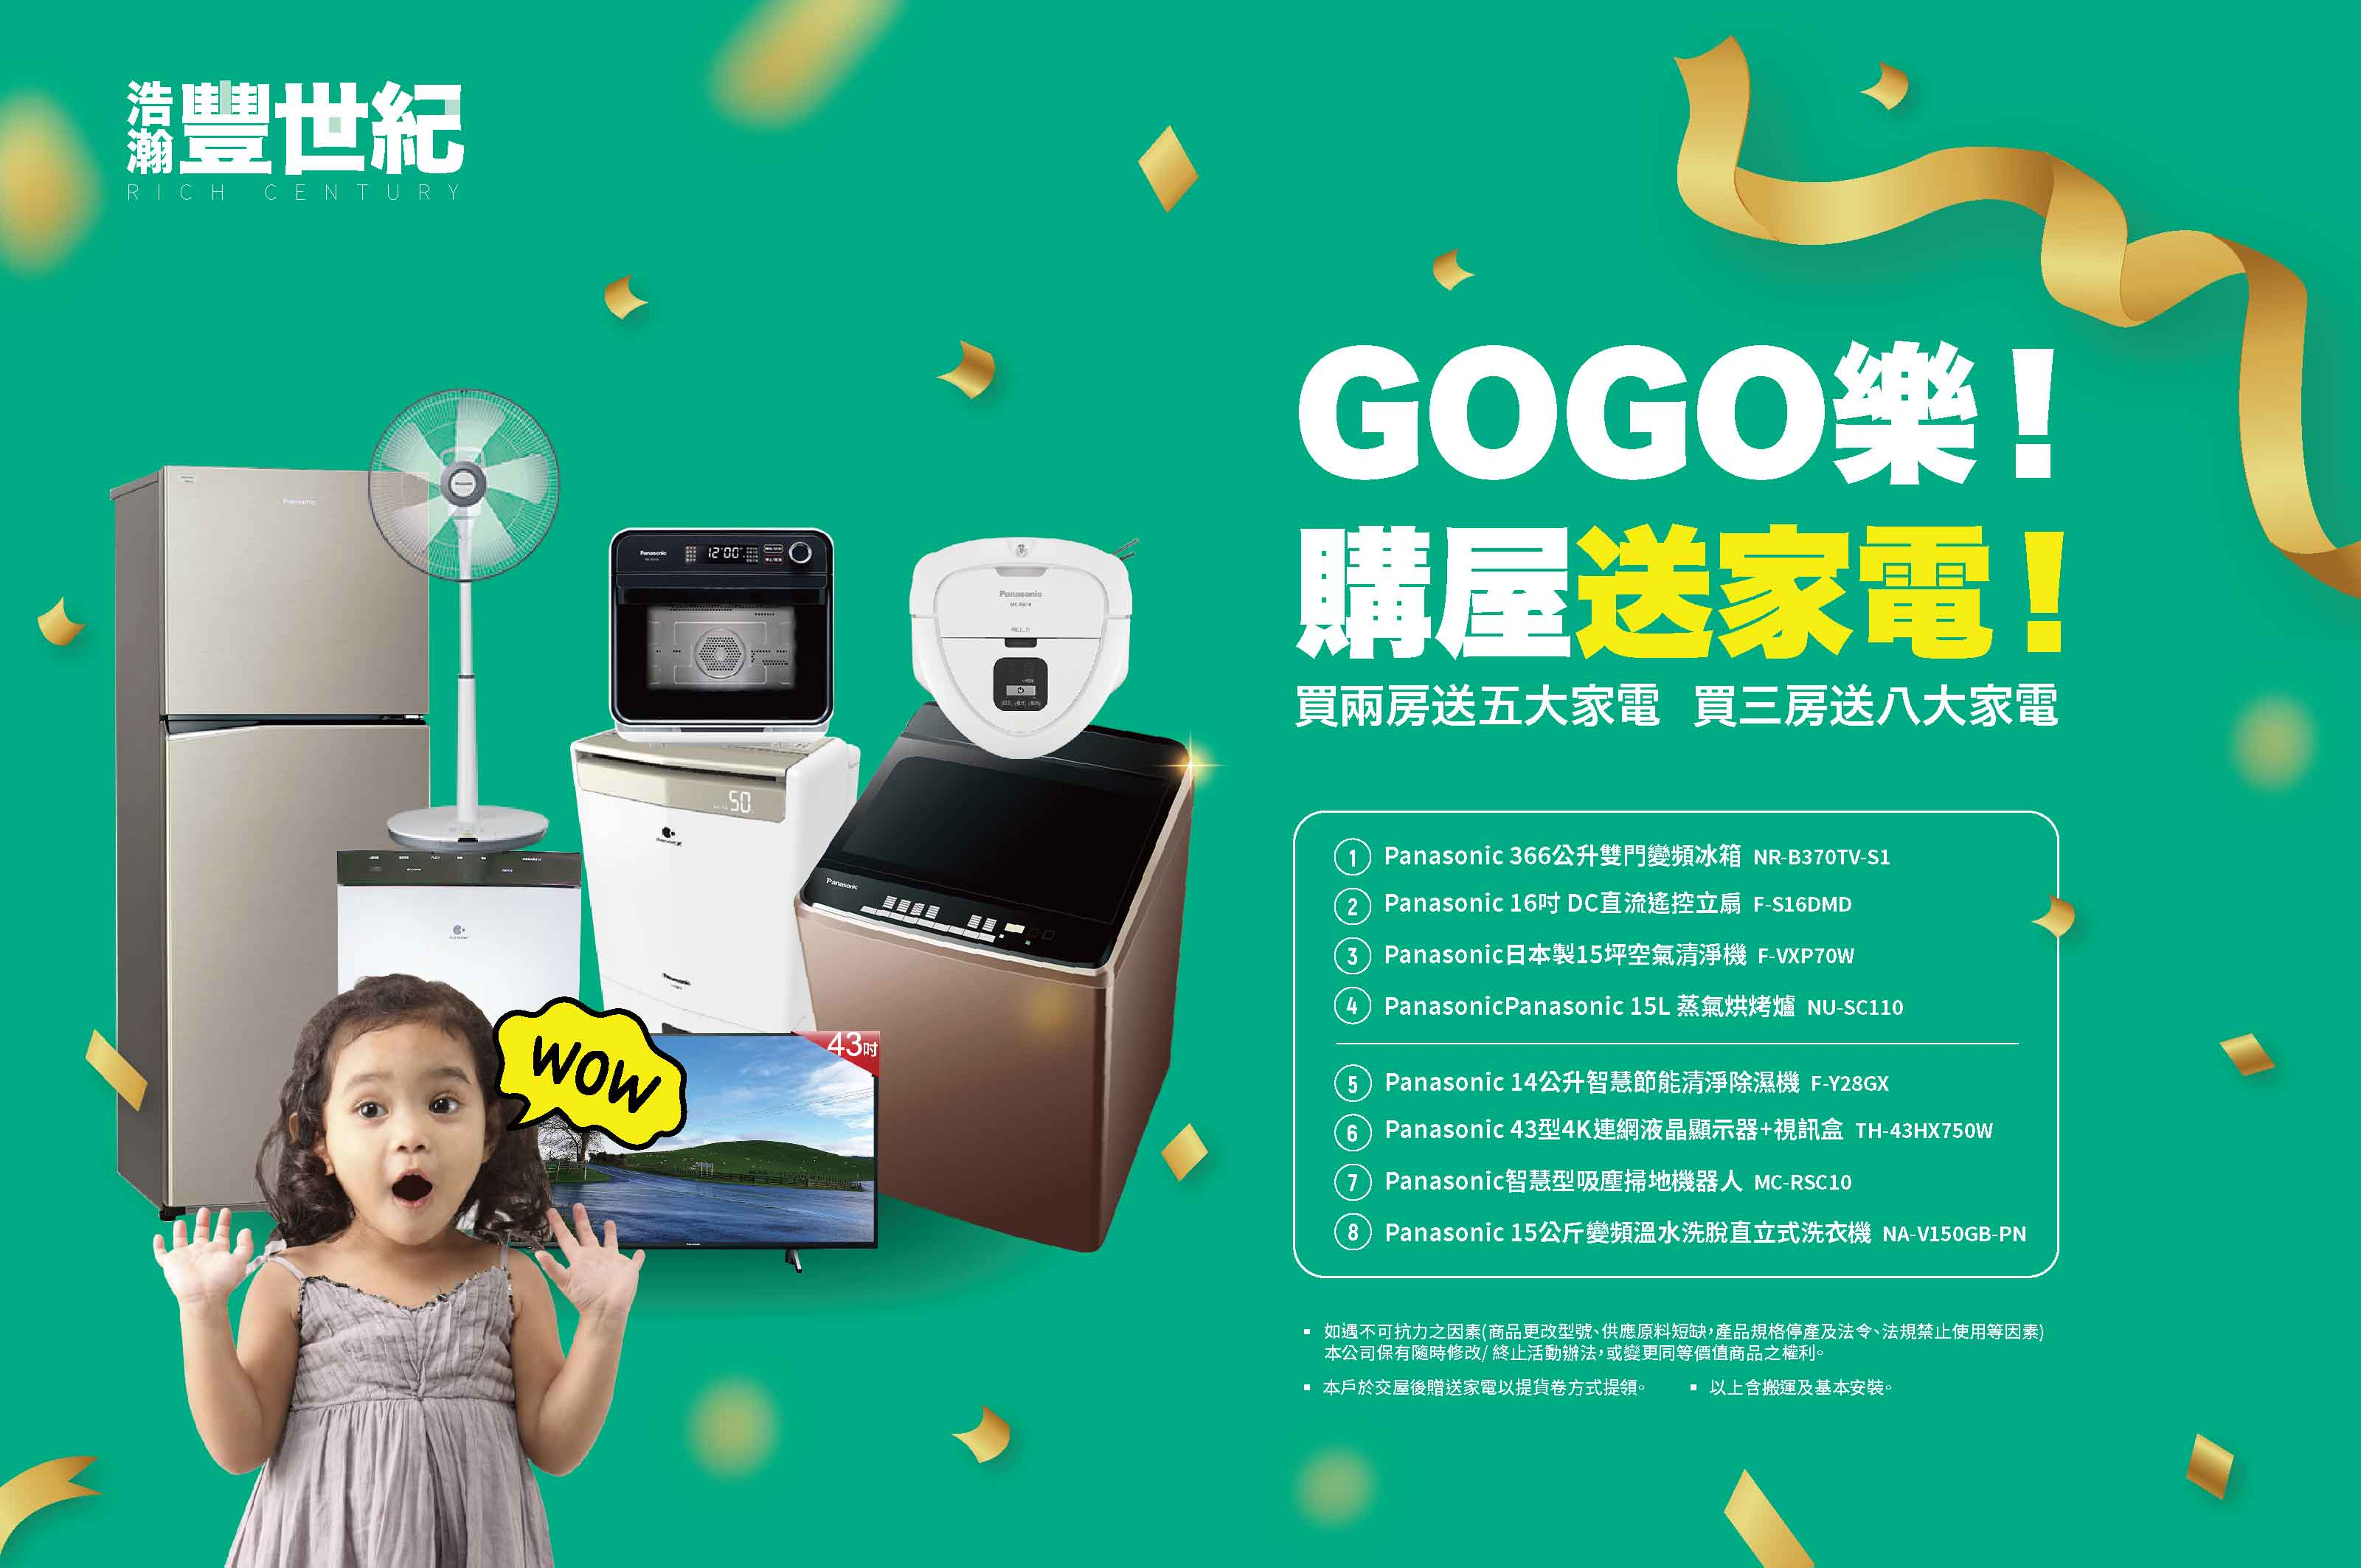 GOGO樂!購屋送家電!